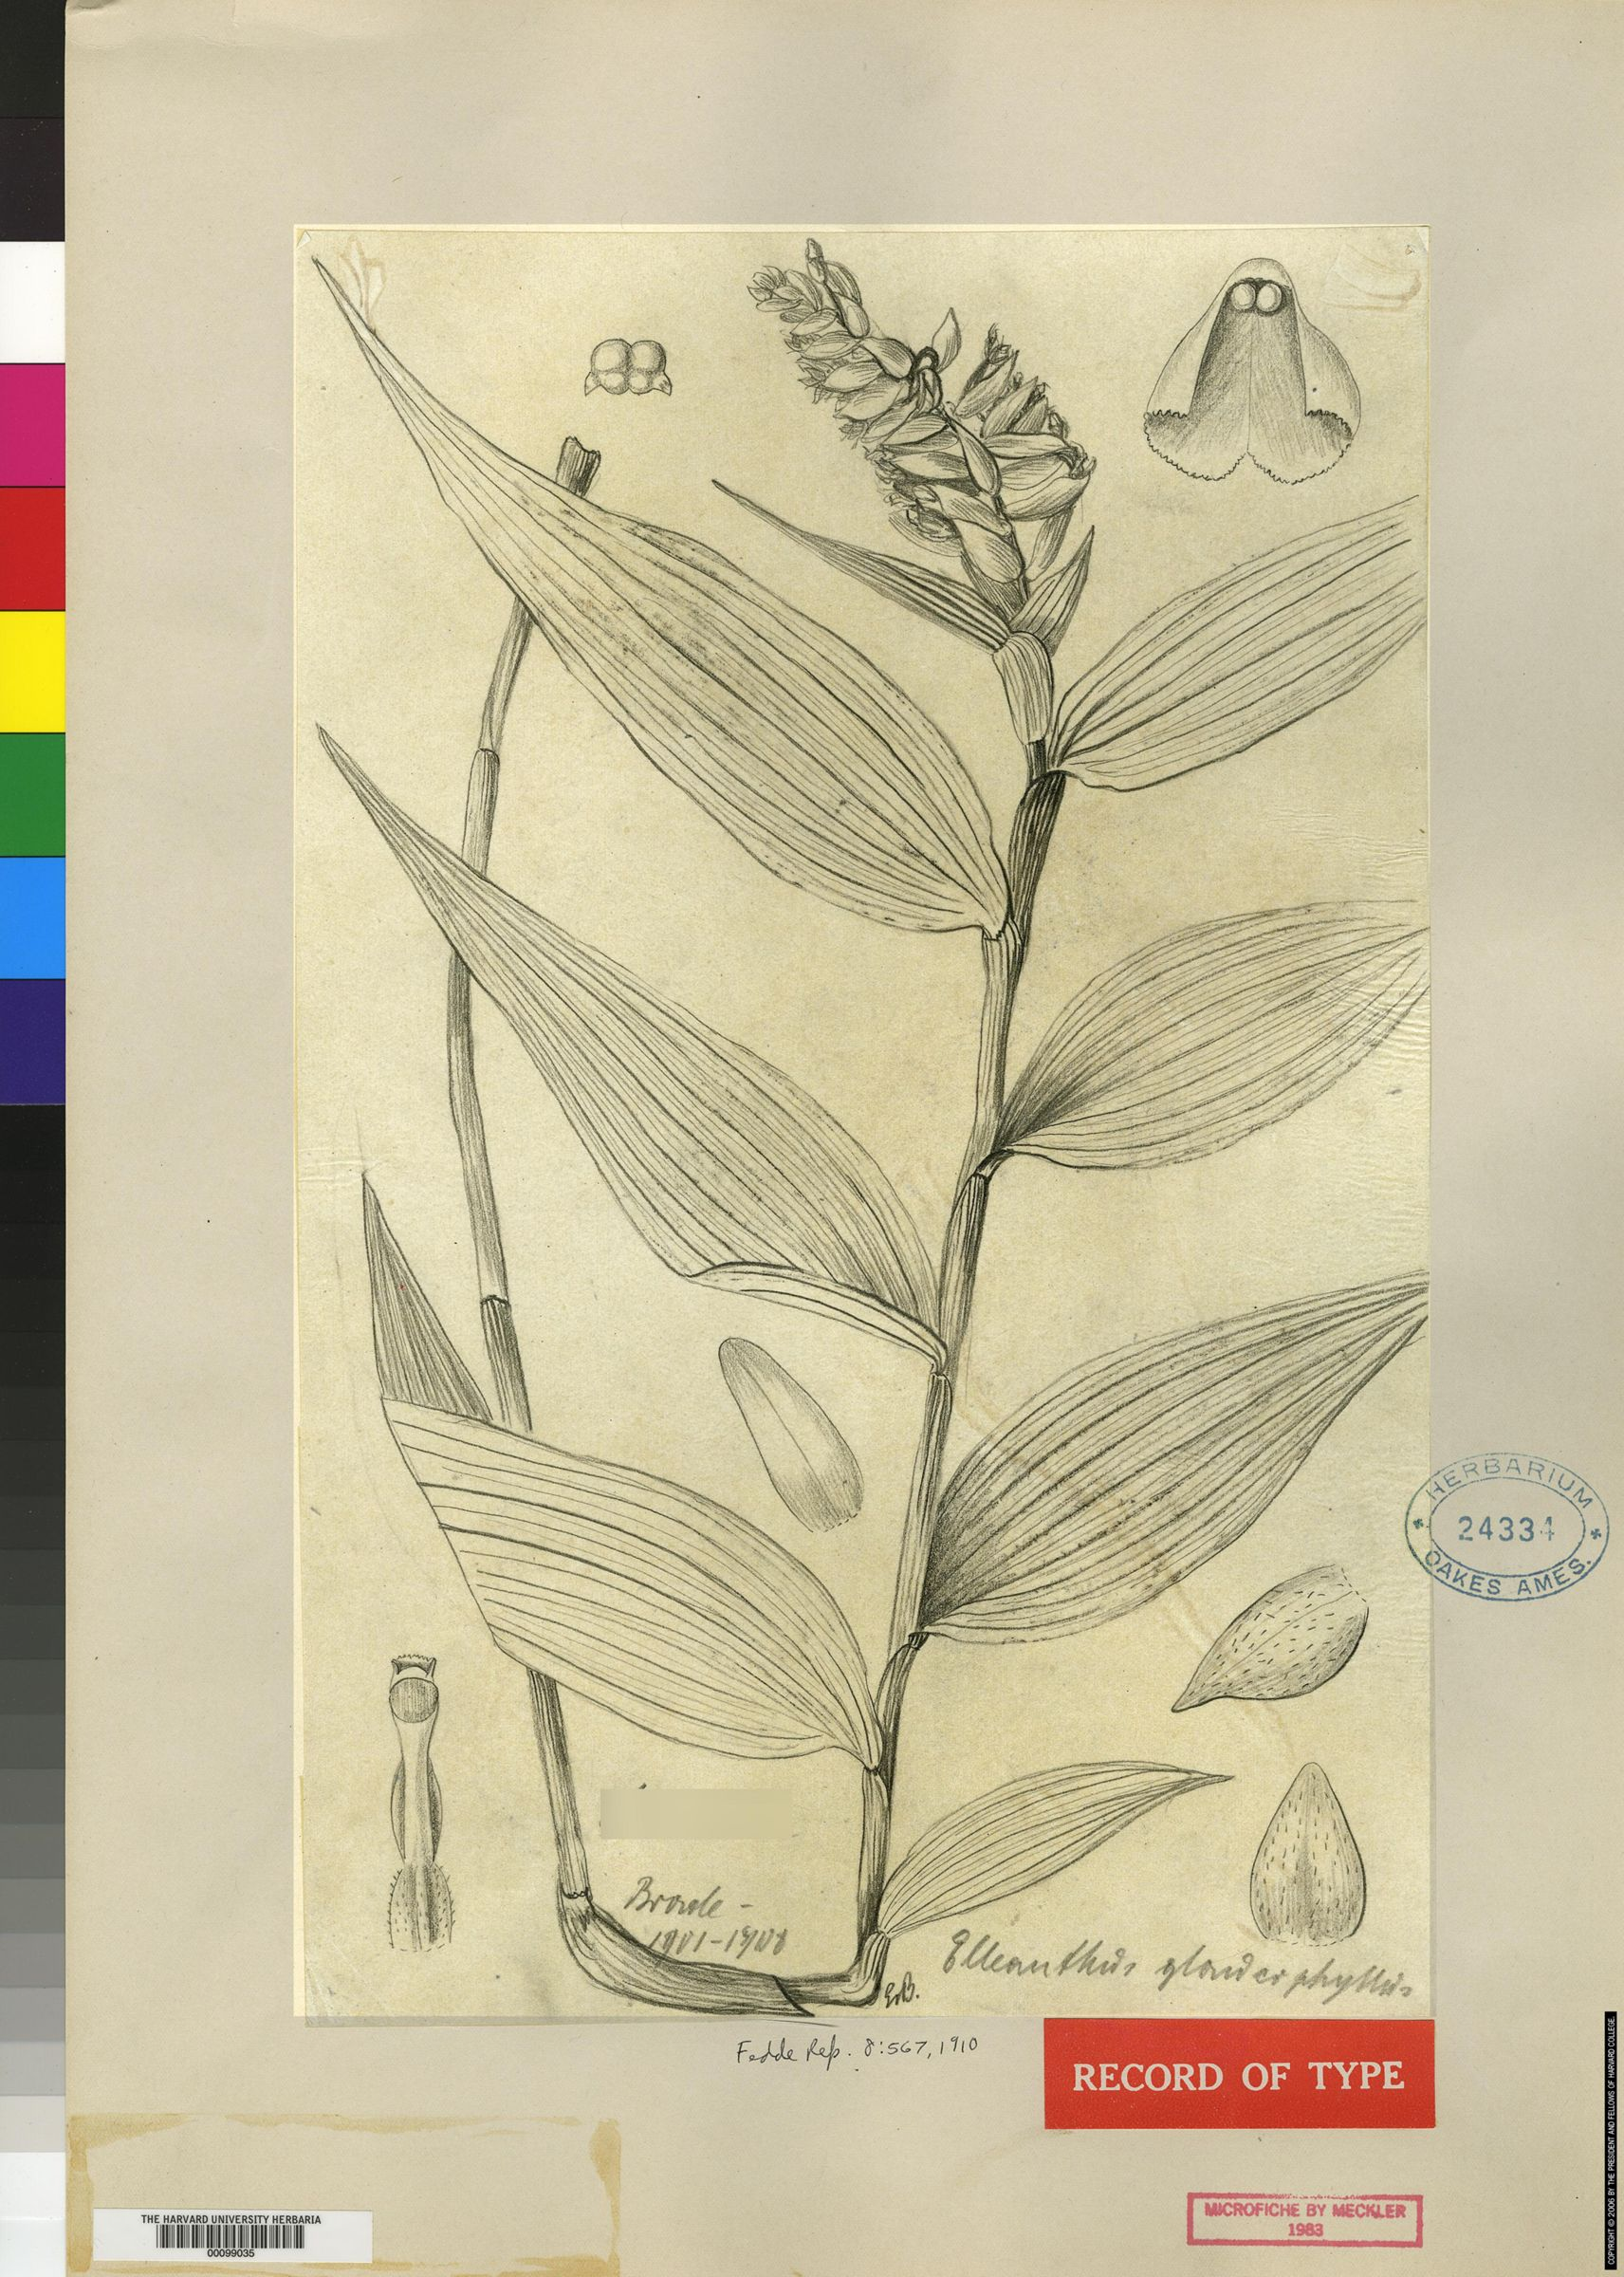 Elleanthus glaucophyllus image